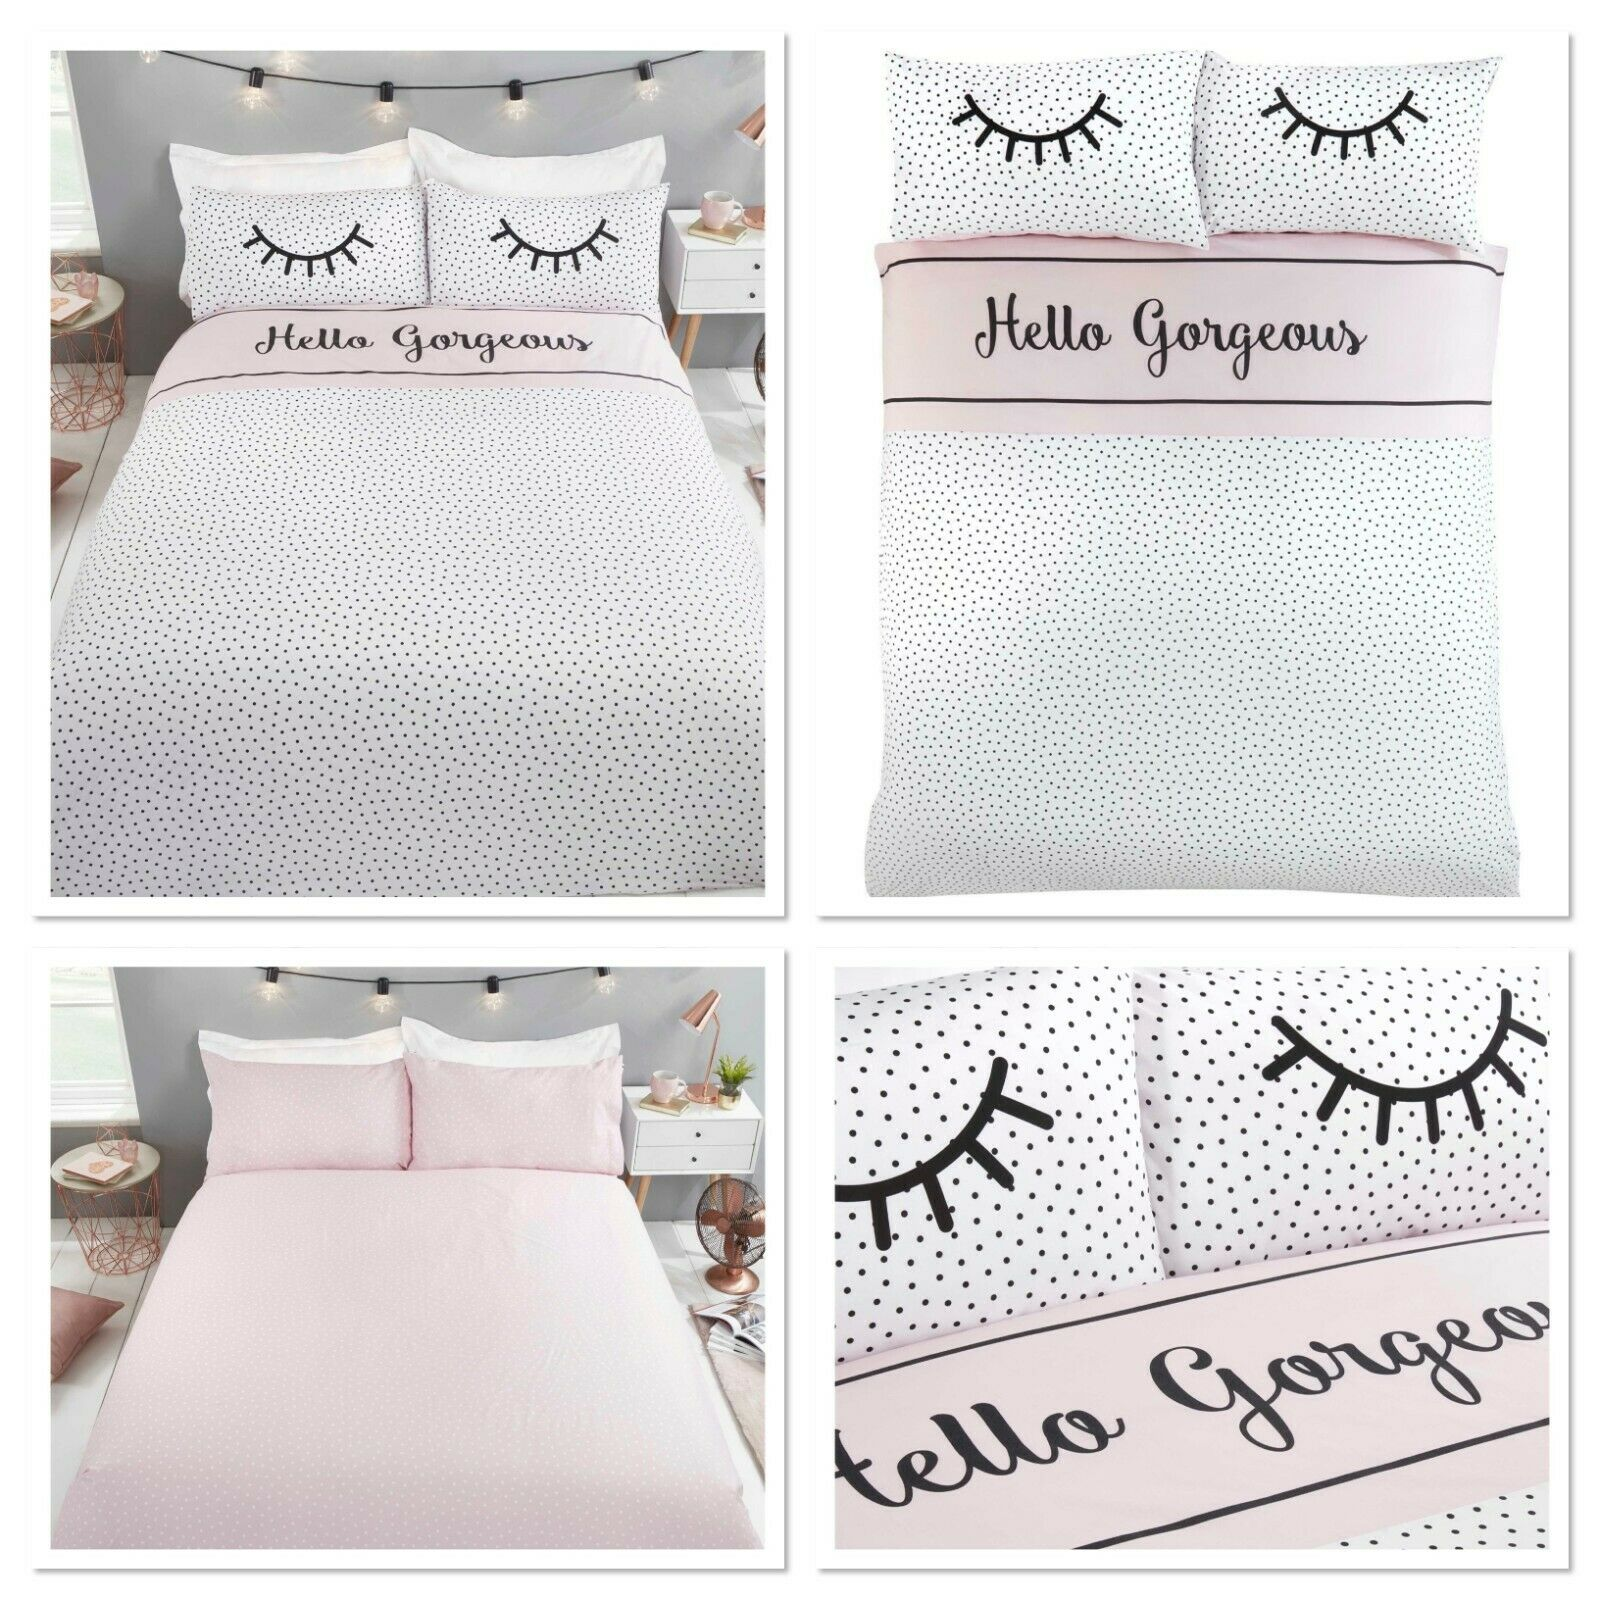 Rapport Hello Gorgeous Polka Dot Reversible Print Duvet Cover Bedding Set Pink Bb Textiles Bb Textiles